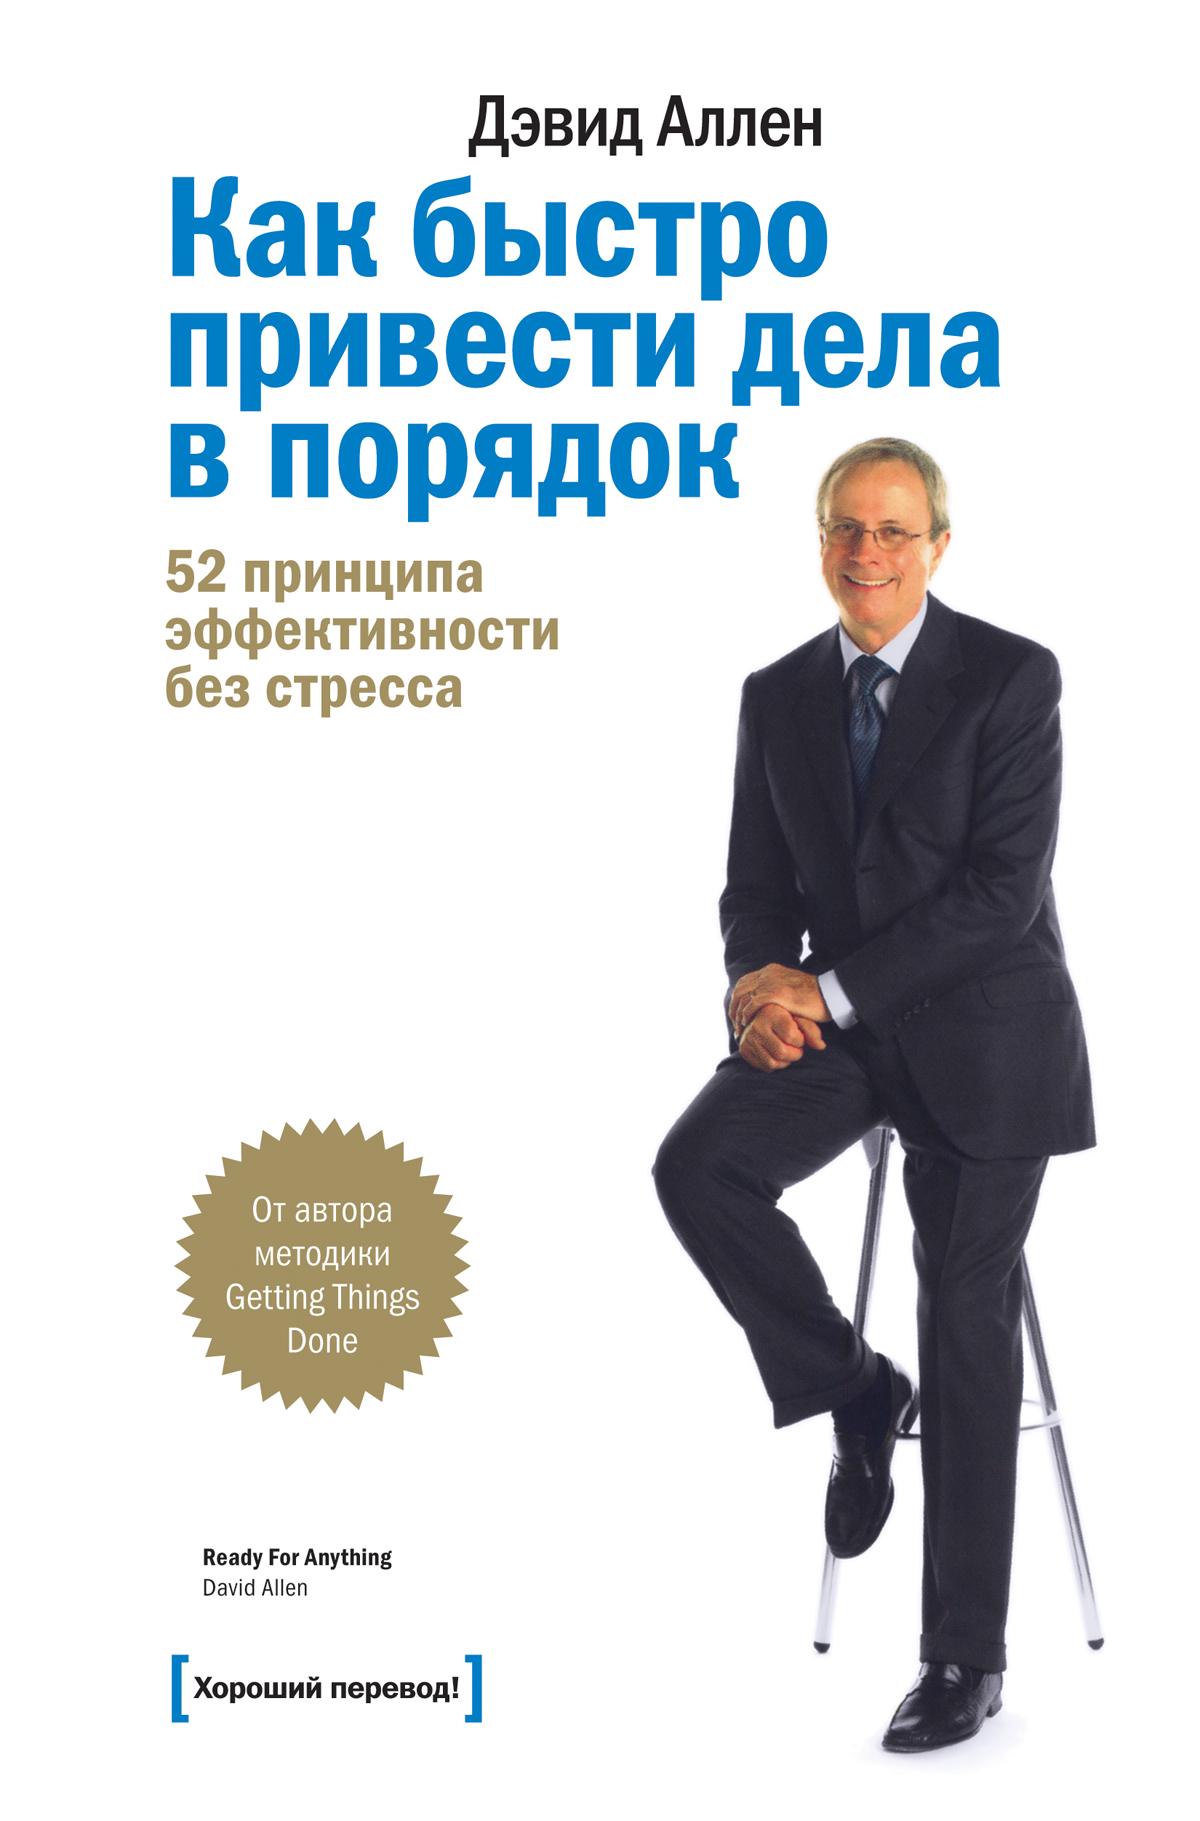 WоMо-книга: Как быстро привести дела в порядок, Дэвид Аллен